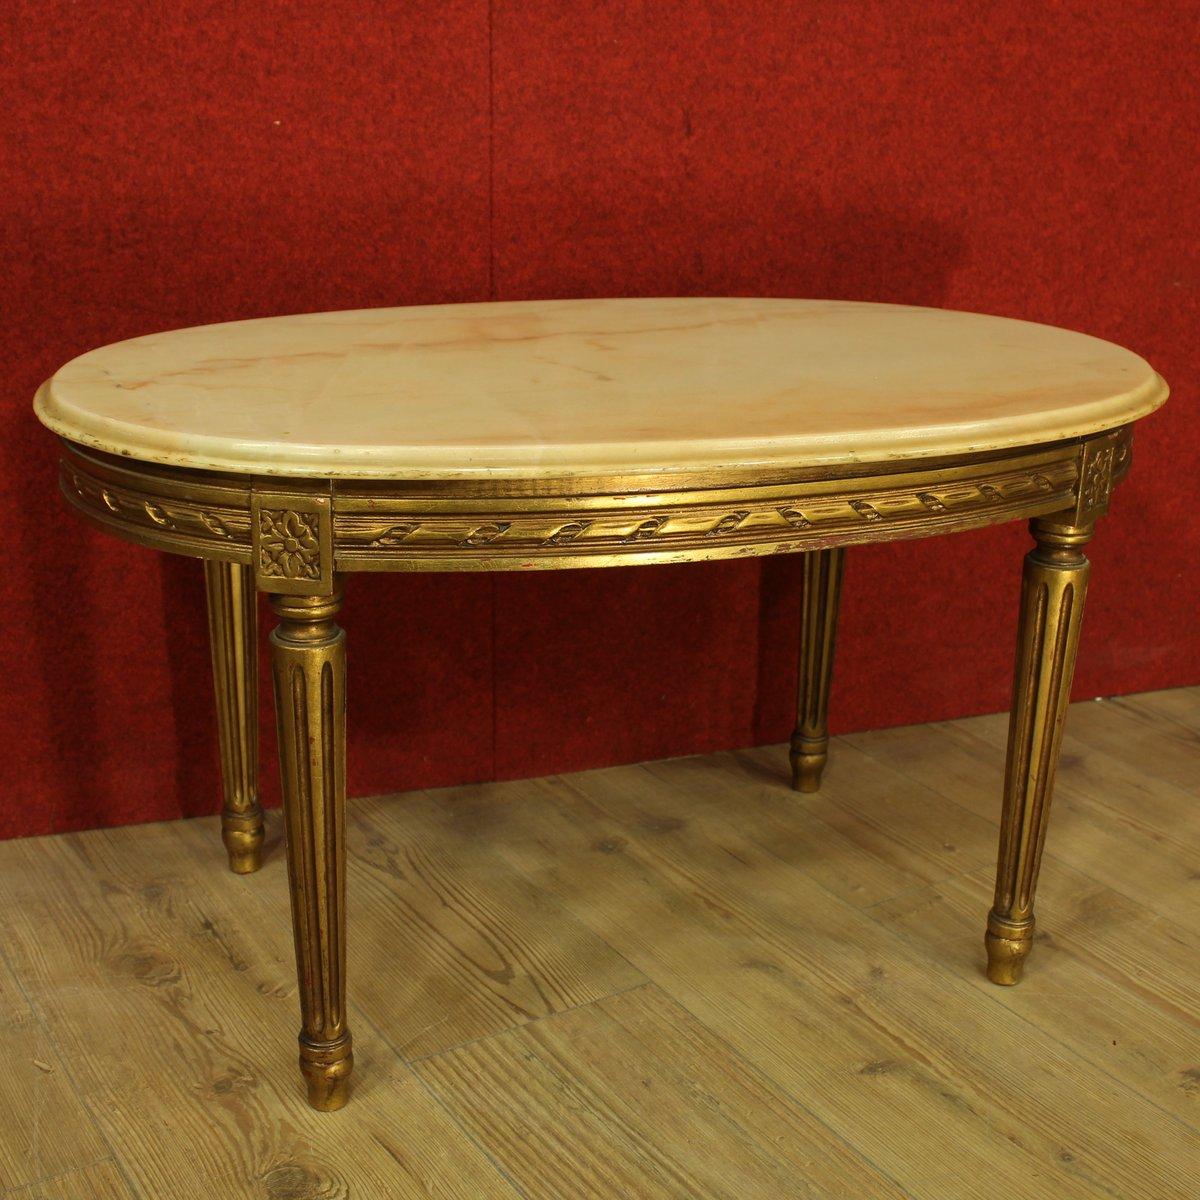 table basse dor e avec dessus en onyx france en vente sur. Black Bedroom Furniture Sets. Home Design Ideas